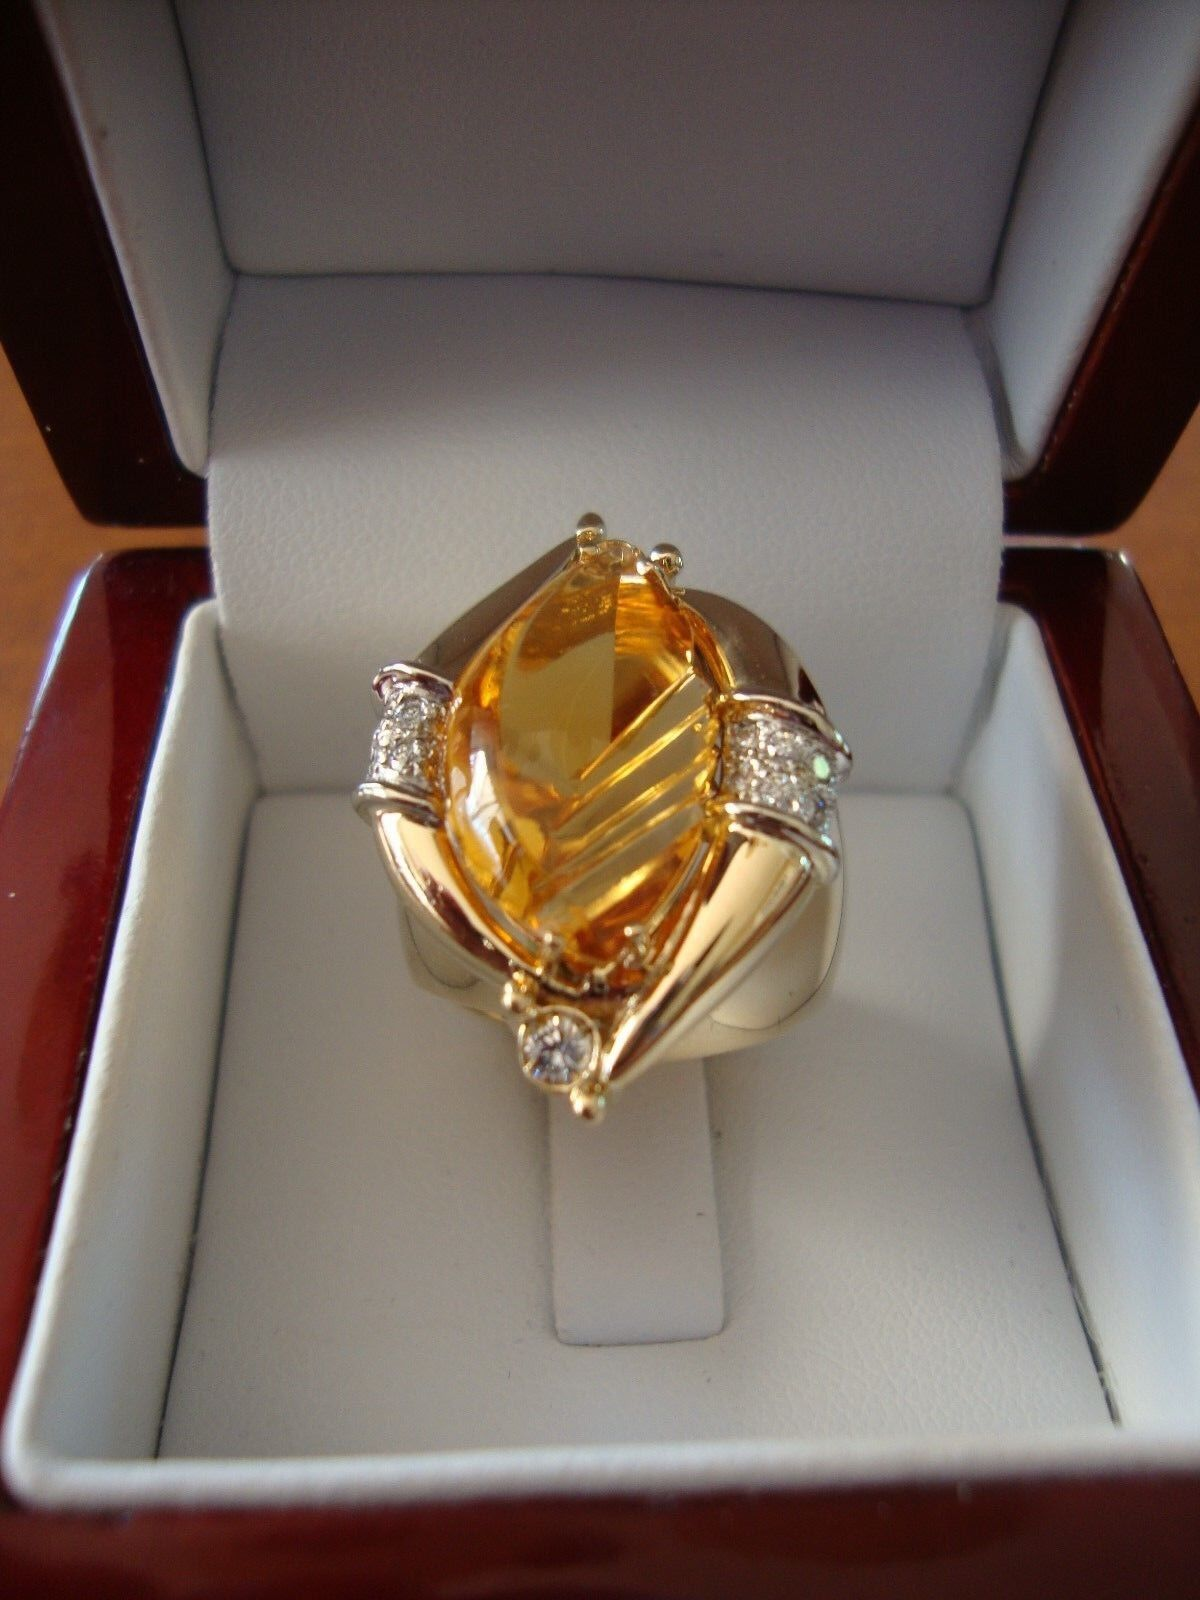 14K YELLOW gold FANCY CUT CITRINE DIAMONDS DESIGNER RING 16.7 GRAMS SIZE 7